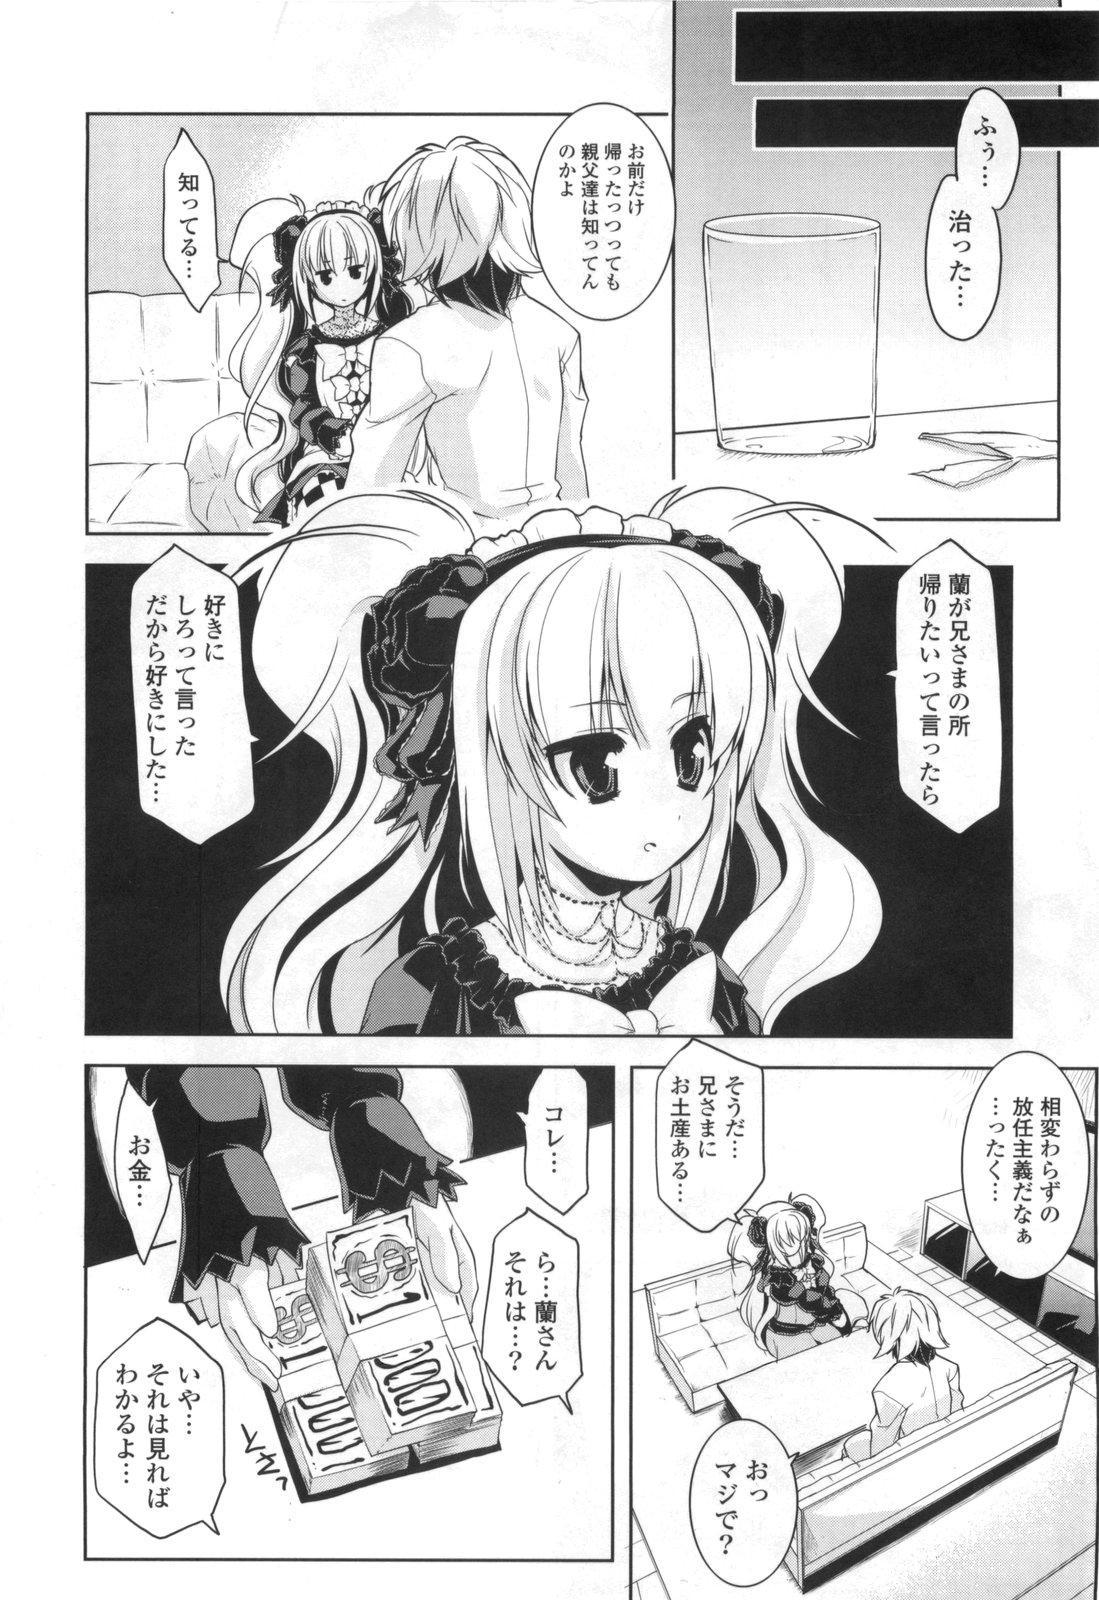 [Gyonikun] Gosyujin-sama Senyou!? Ami-sama Senyou 99